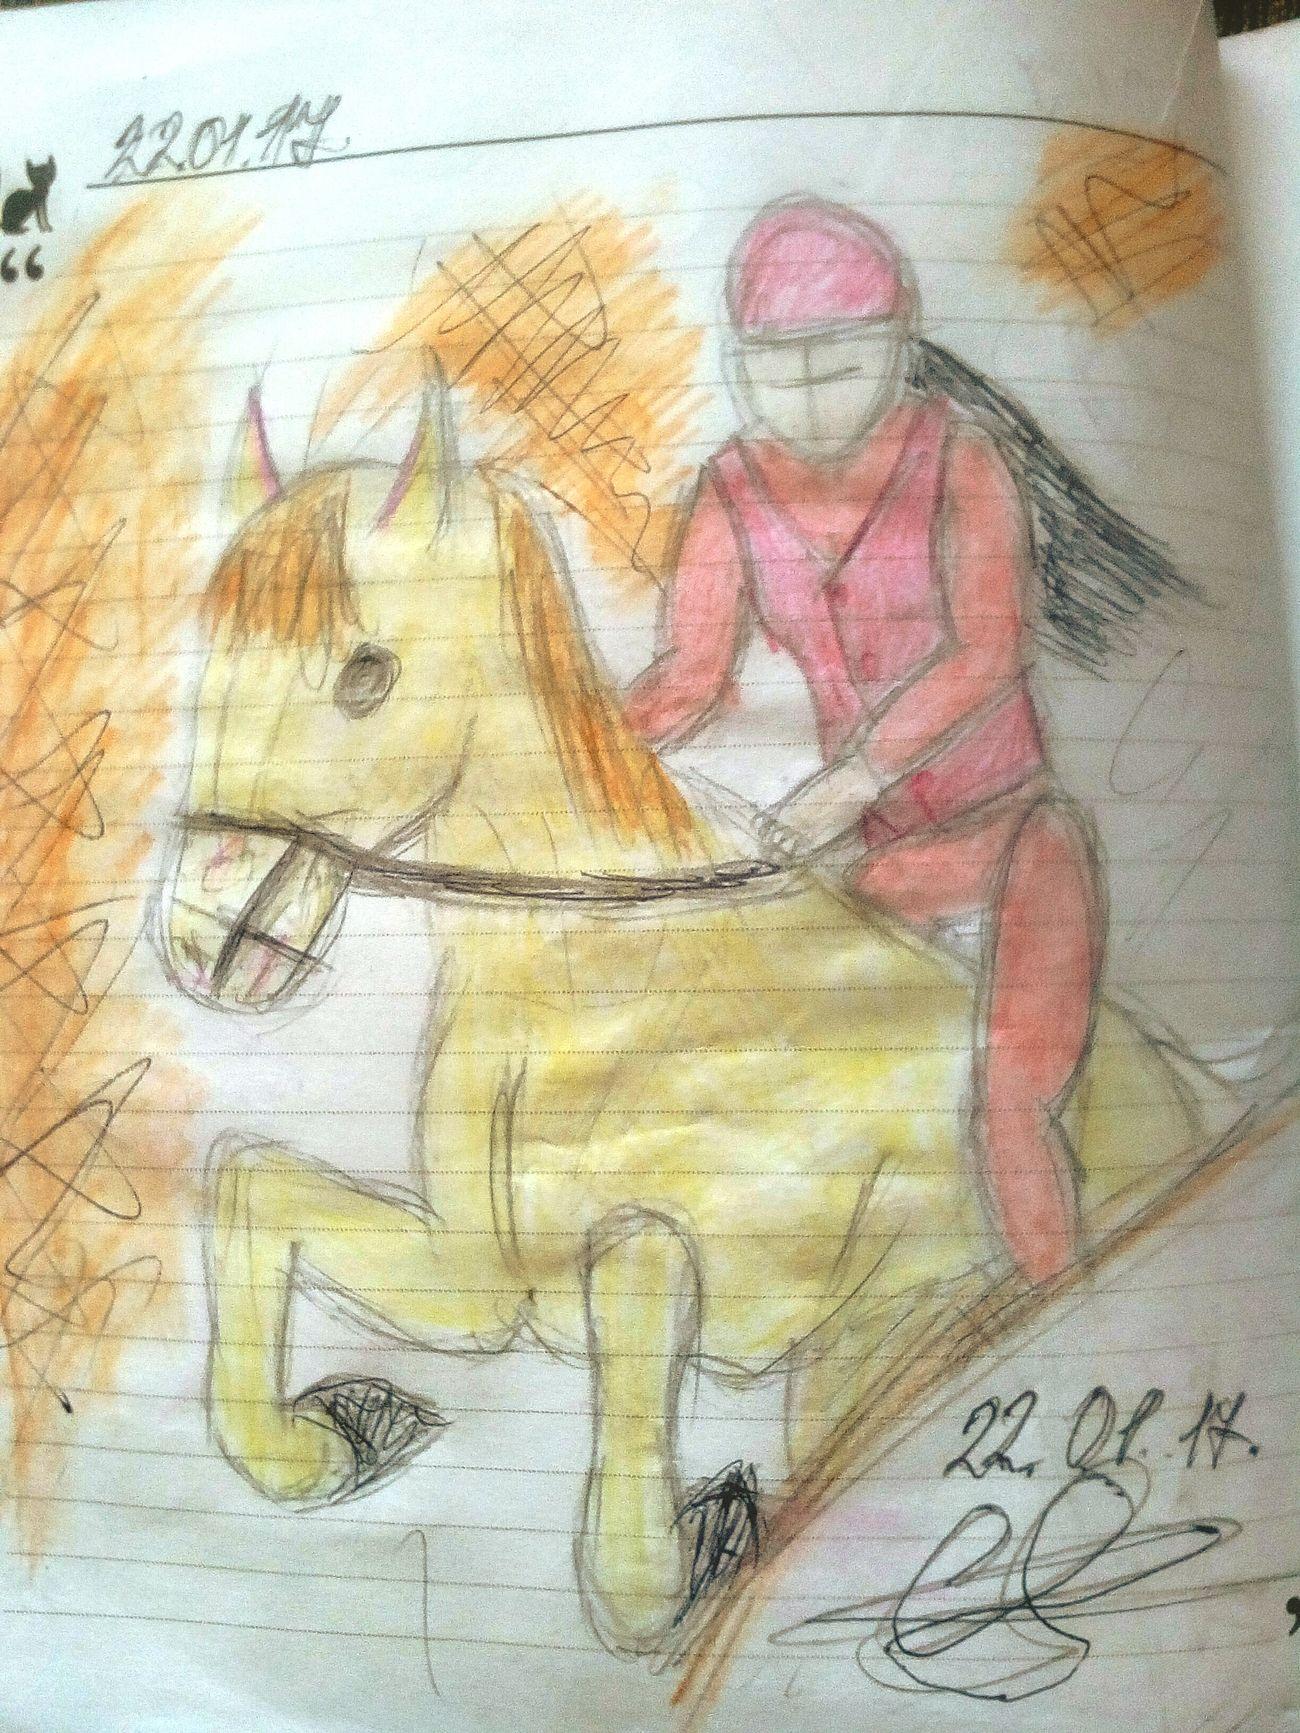 Painted Image лошадь People рисунок First Eyeem Photo